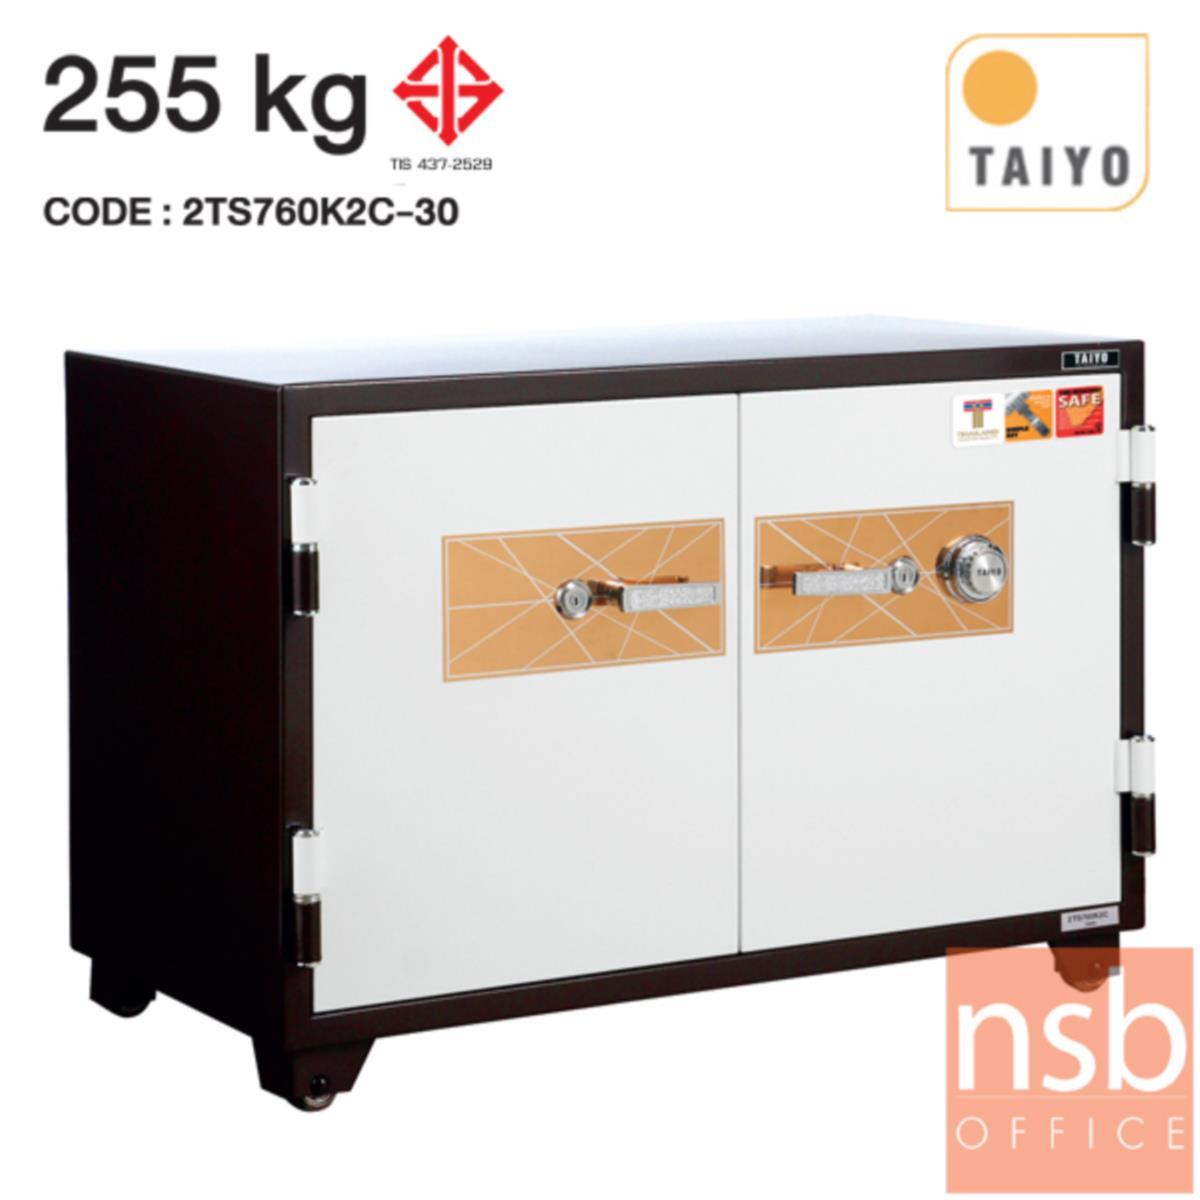 F01A035: TAIYO Pink Gold น้ำหนัก 255 กก.มี มอก. 2 บานเปิด (2TS760K2C-30)